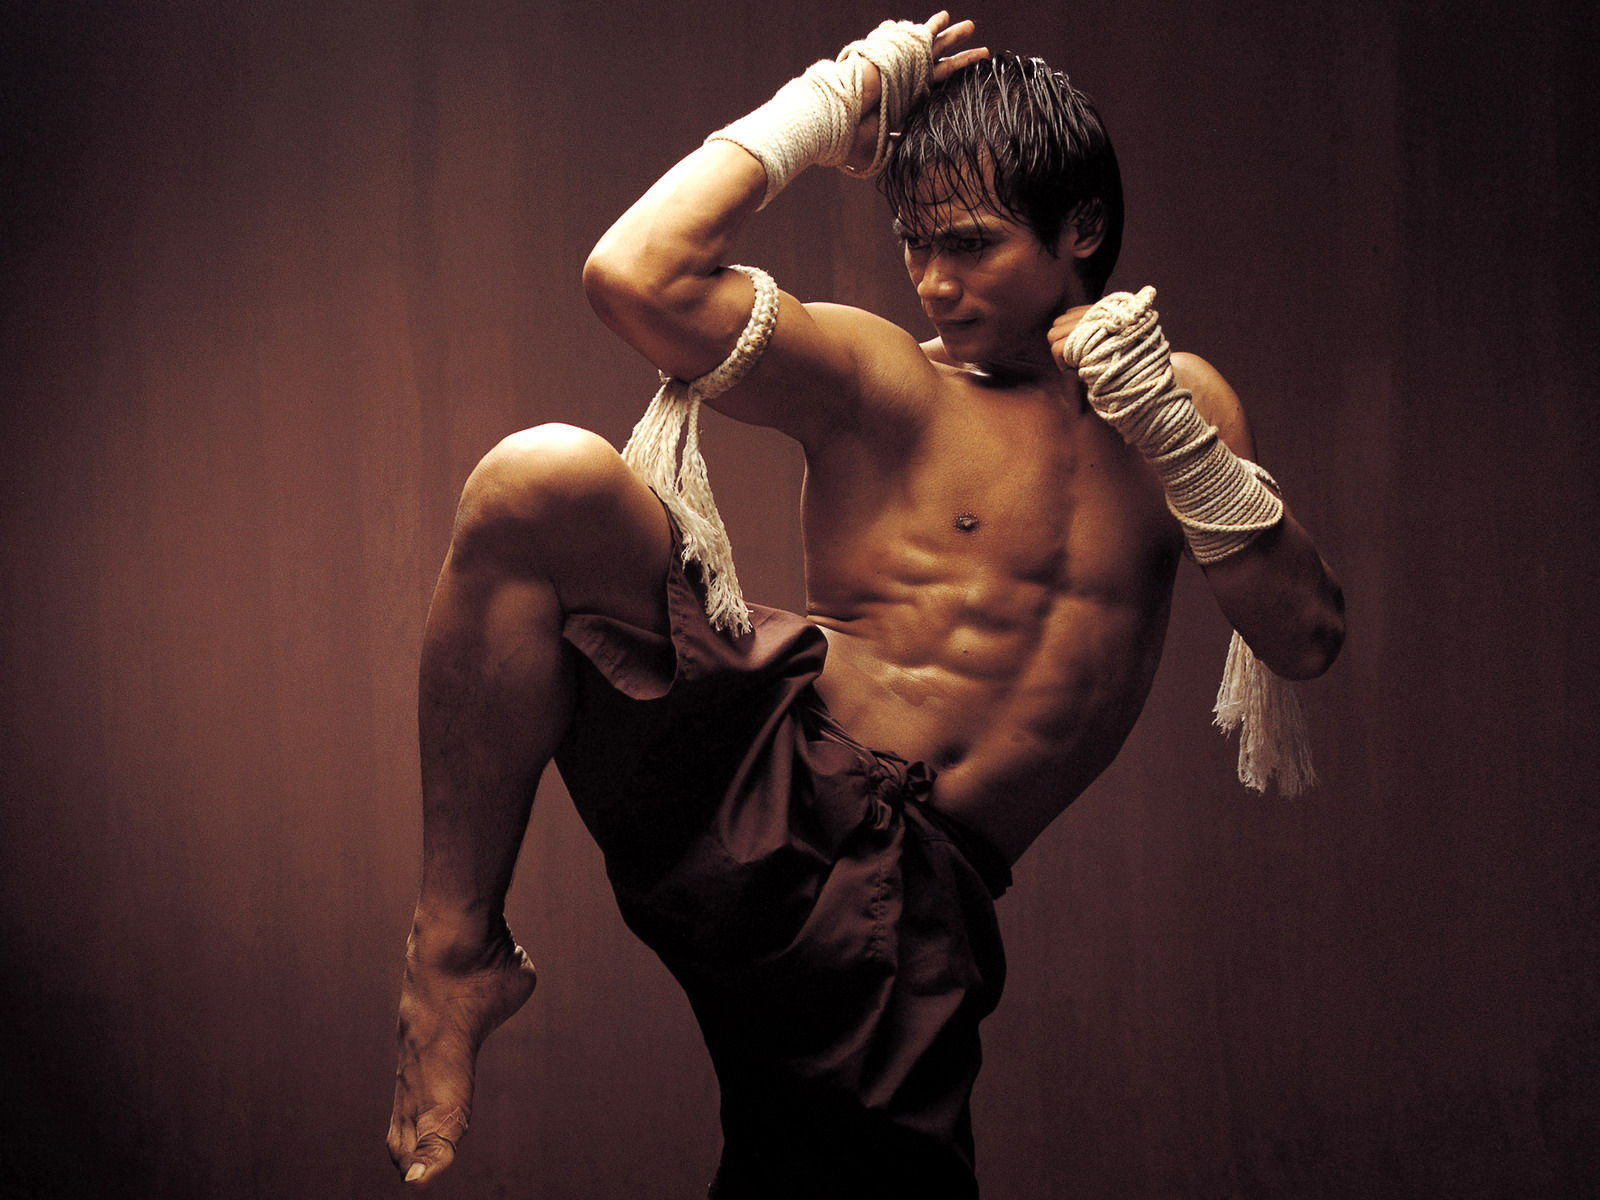 Myuai thai, фото скачать фото, тайский бокс